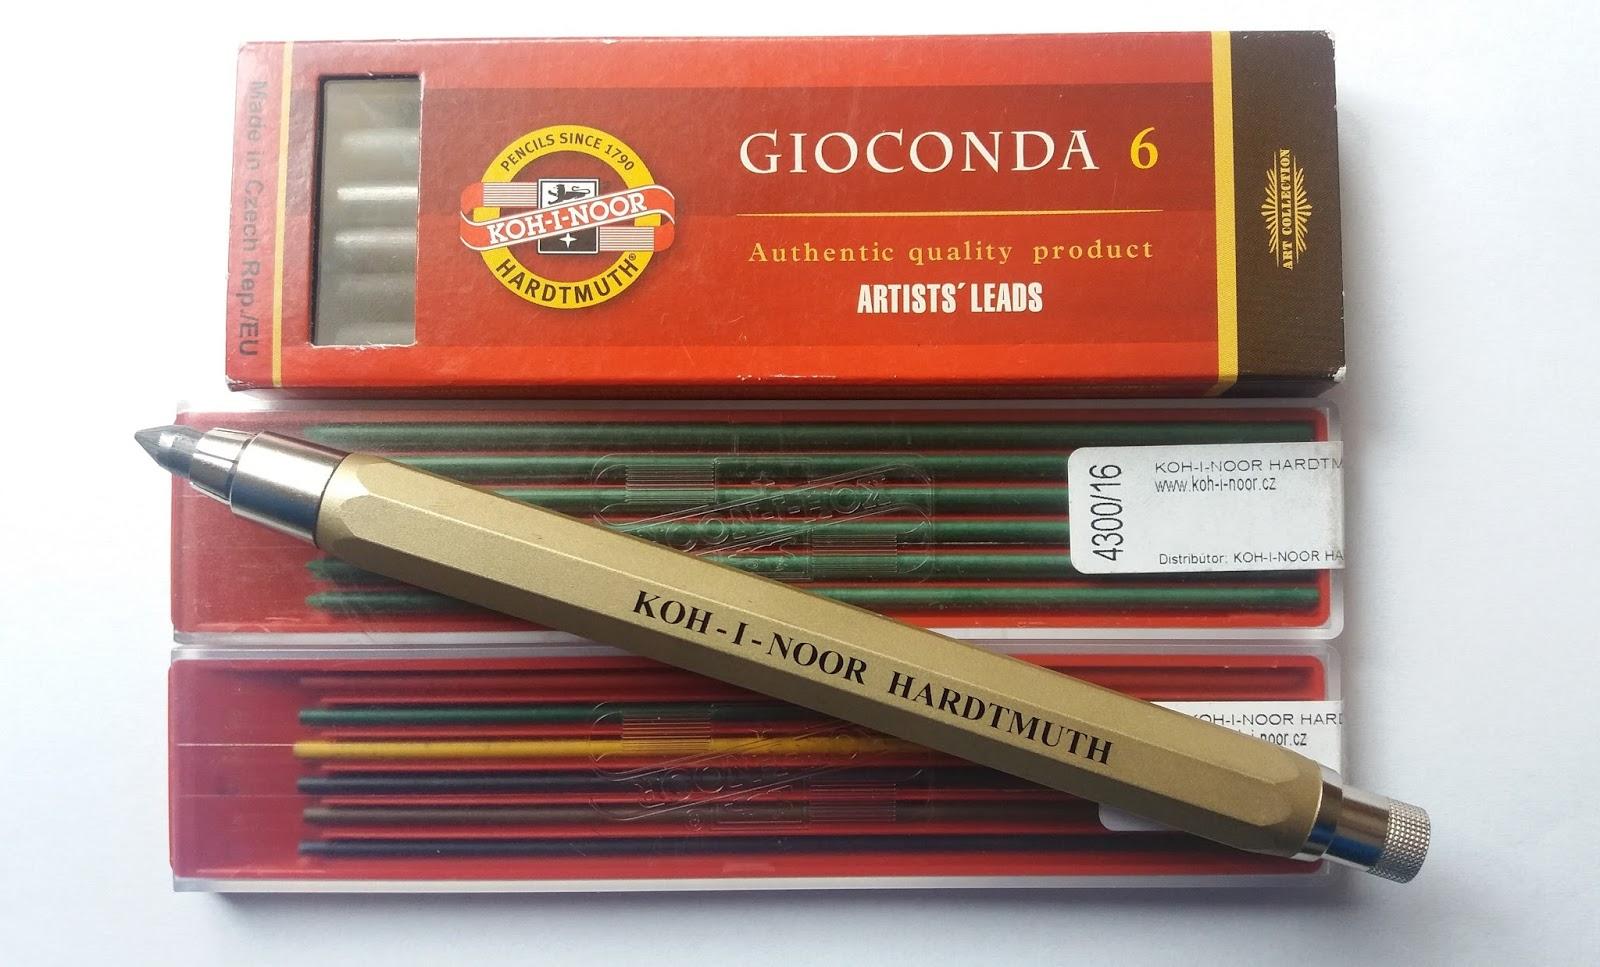 office paper holders. Koh-i-noor Harmuth Pencil Lead Holder 5.6 Mm Artist Office Paper Holders